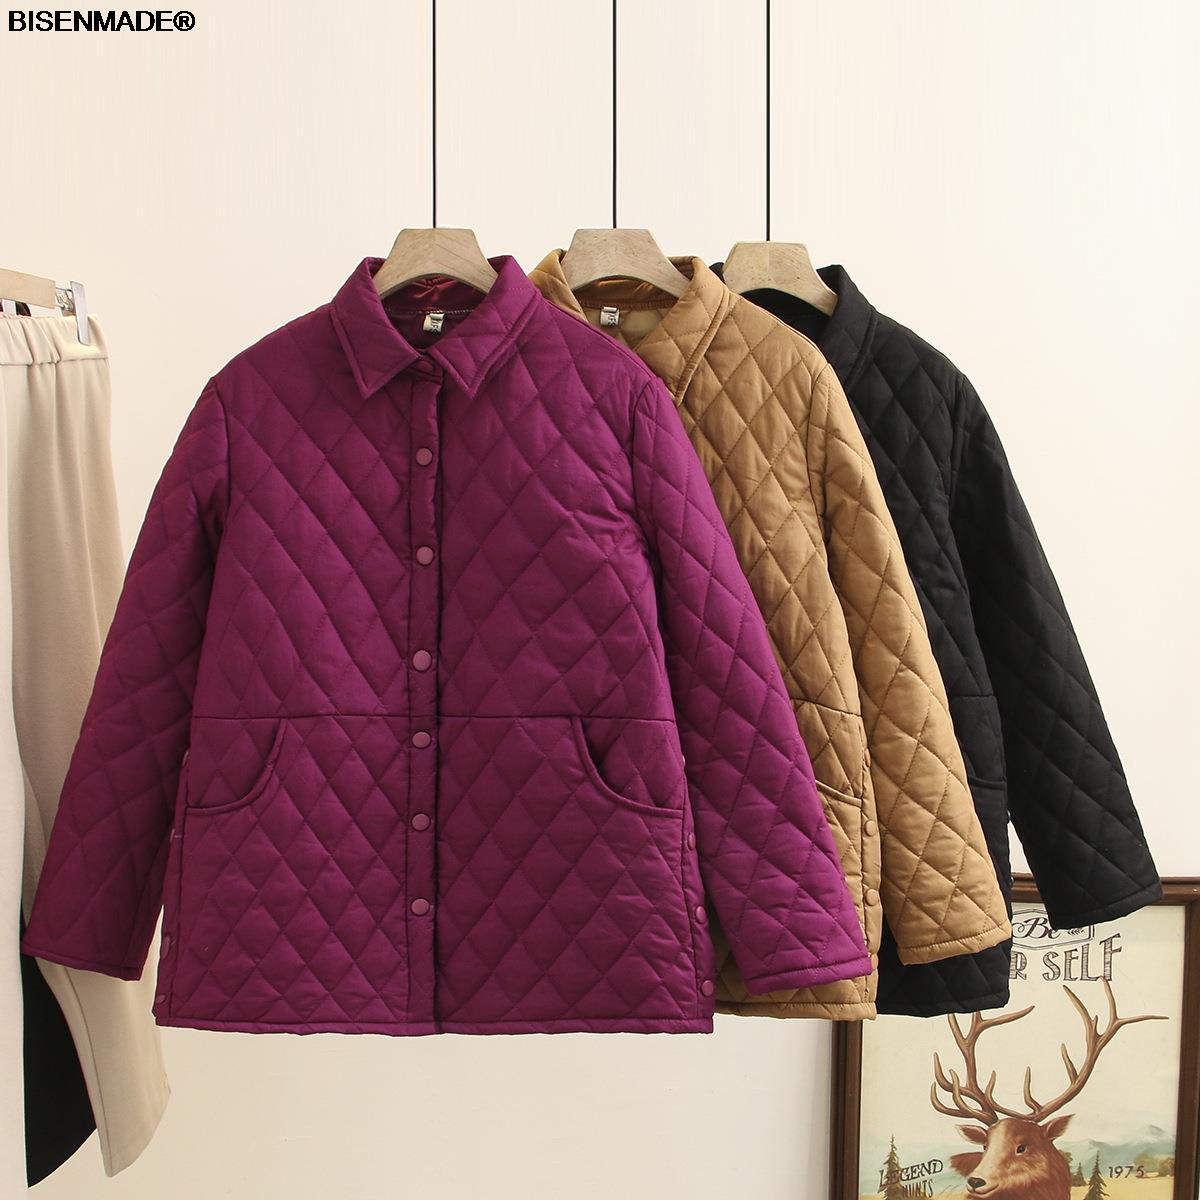 Autumn Winter Parka Women Clothes Plus Size&Curve 2021 New Padded Coat Argyle Warm Outerwear Fashion Casual Loose Jacket